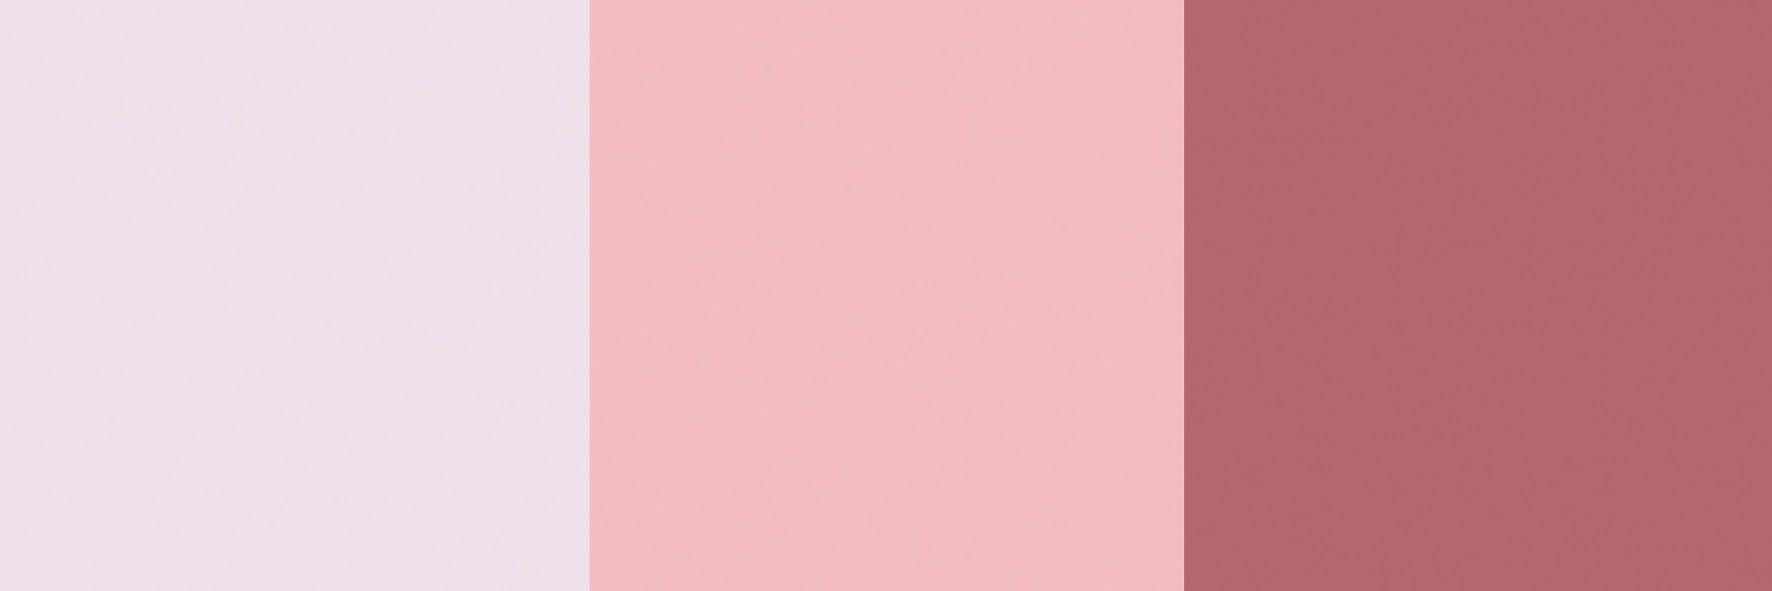 Da esquerda para a direita: Lukscolor Pale rose, Suvinil Rosa neon, Coral Rosa vermelha.